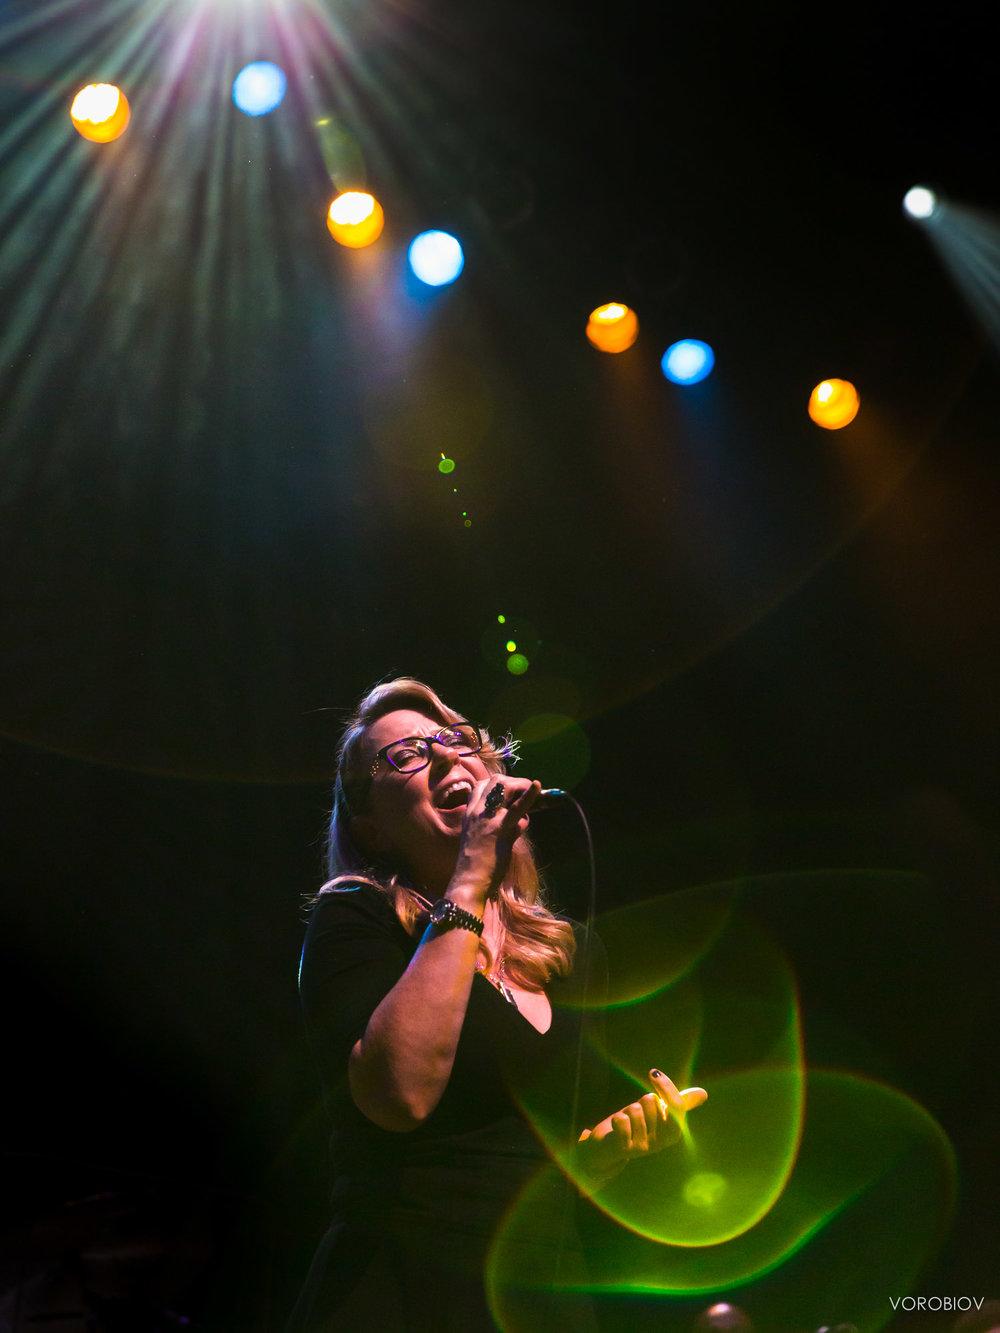 Susan Tedeschi - Tedeschi Trucks Band